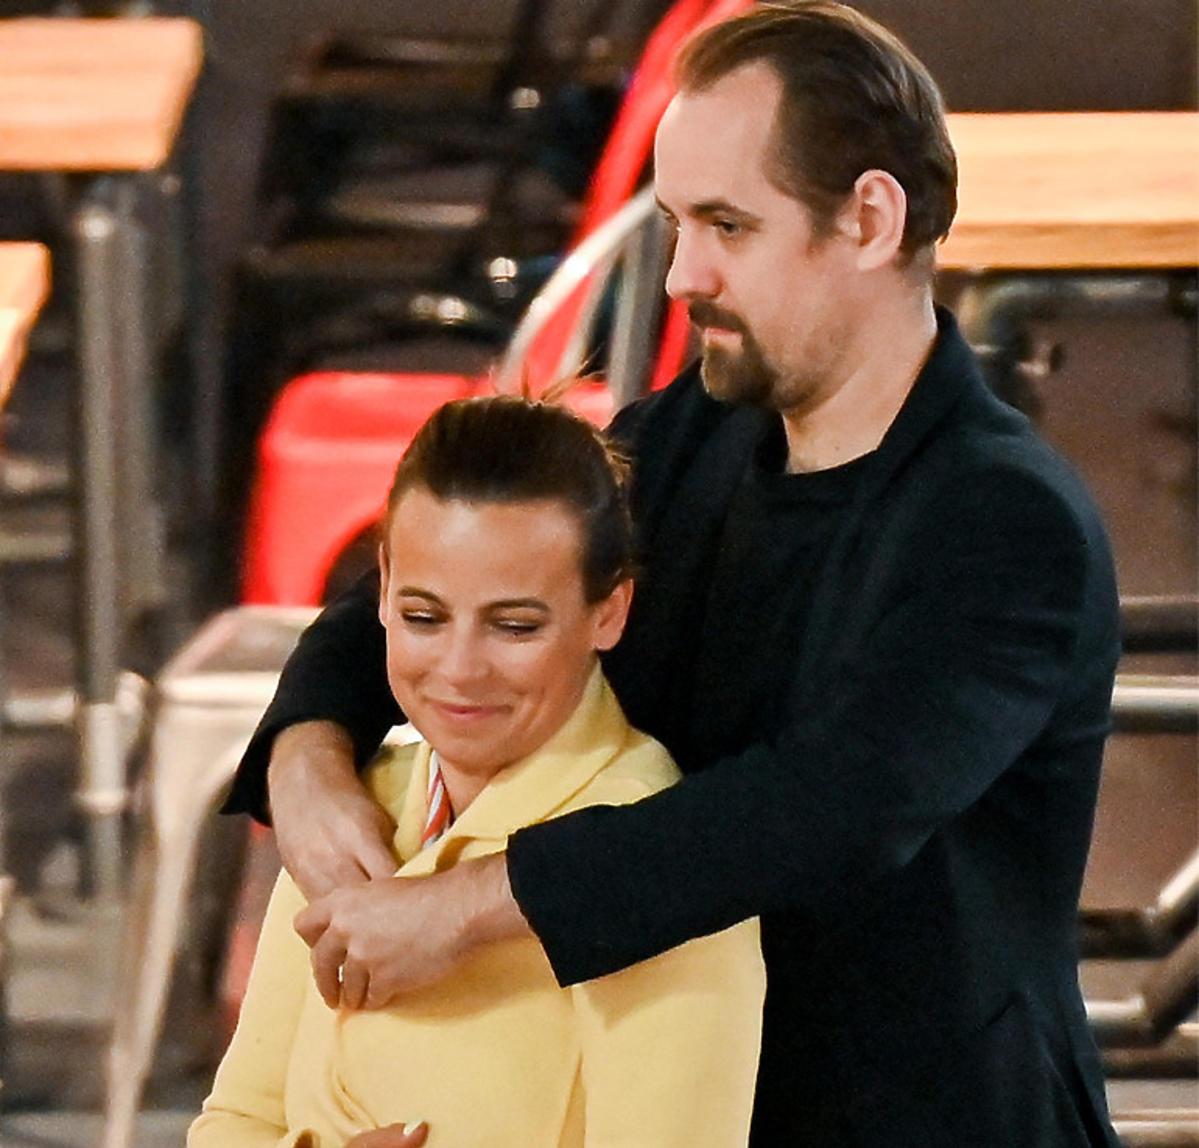 Anna Mucha i Jakub Wons są parą